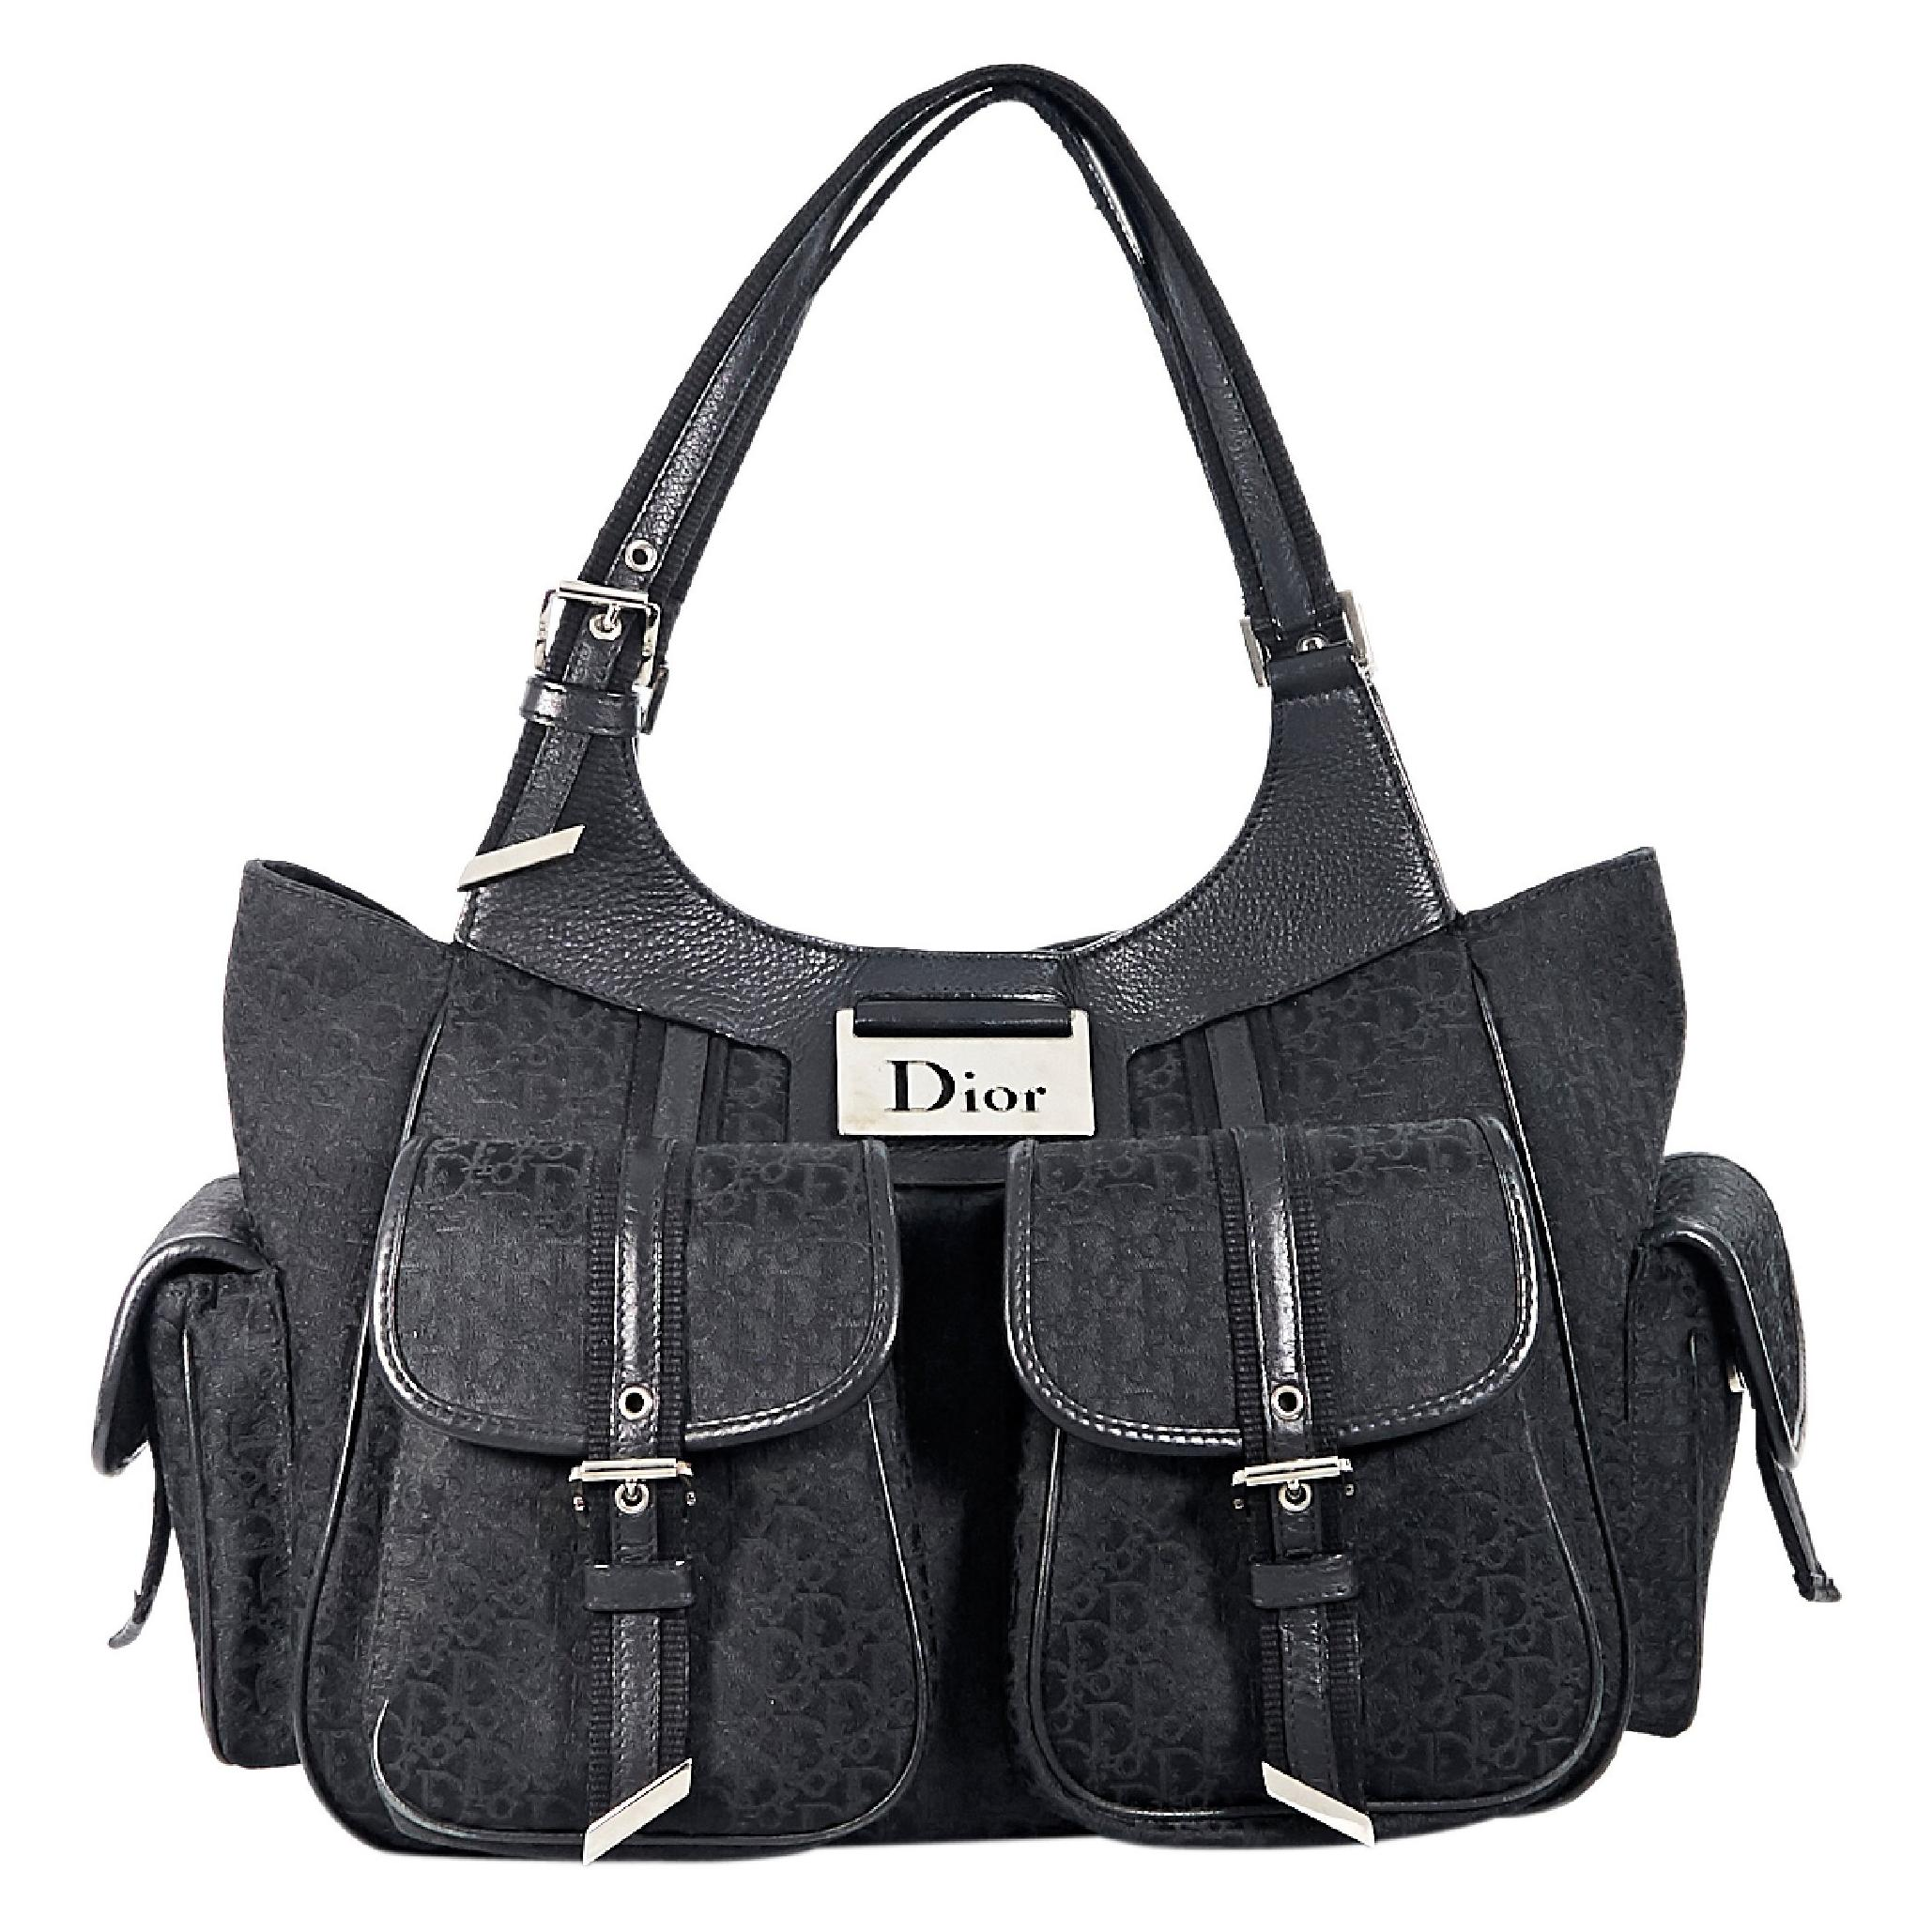 Christian Dior Diorissma Black Shoulder Bag For Sale at 1stdibs 124255e7383f0